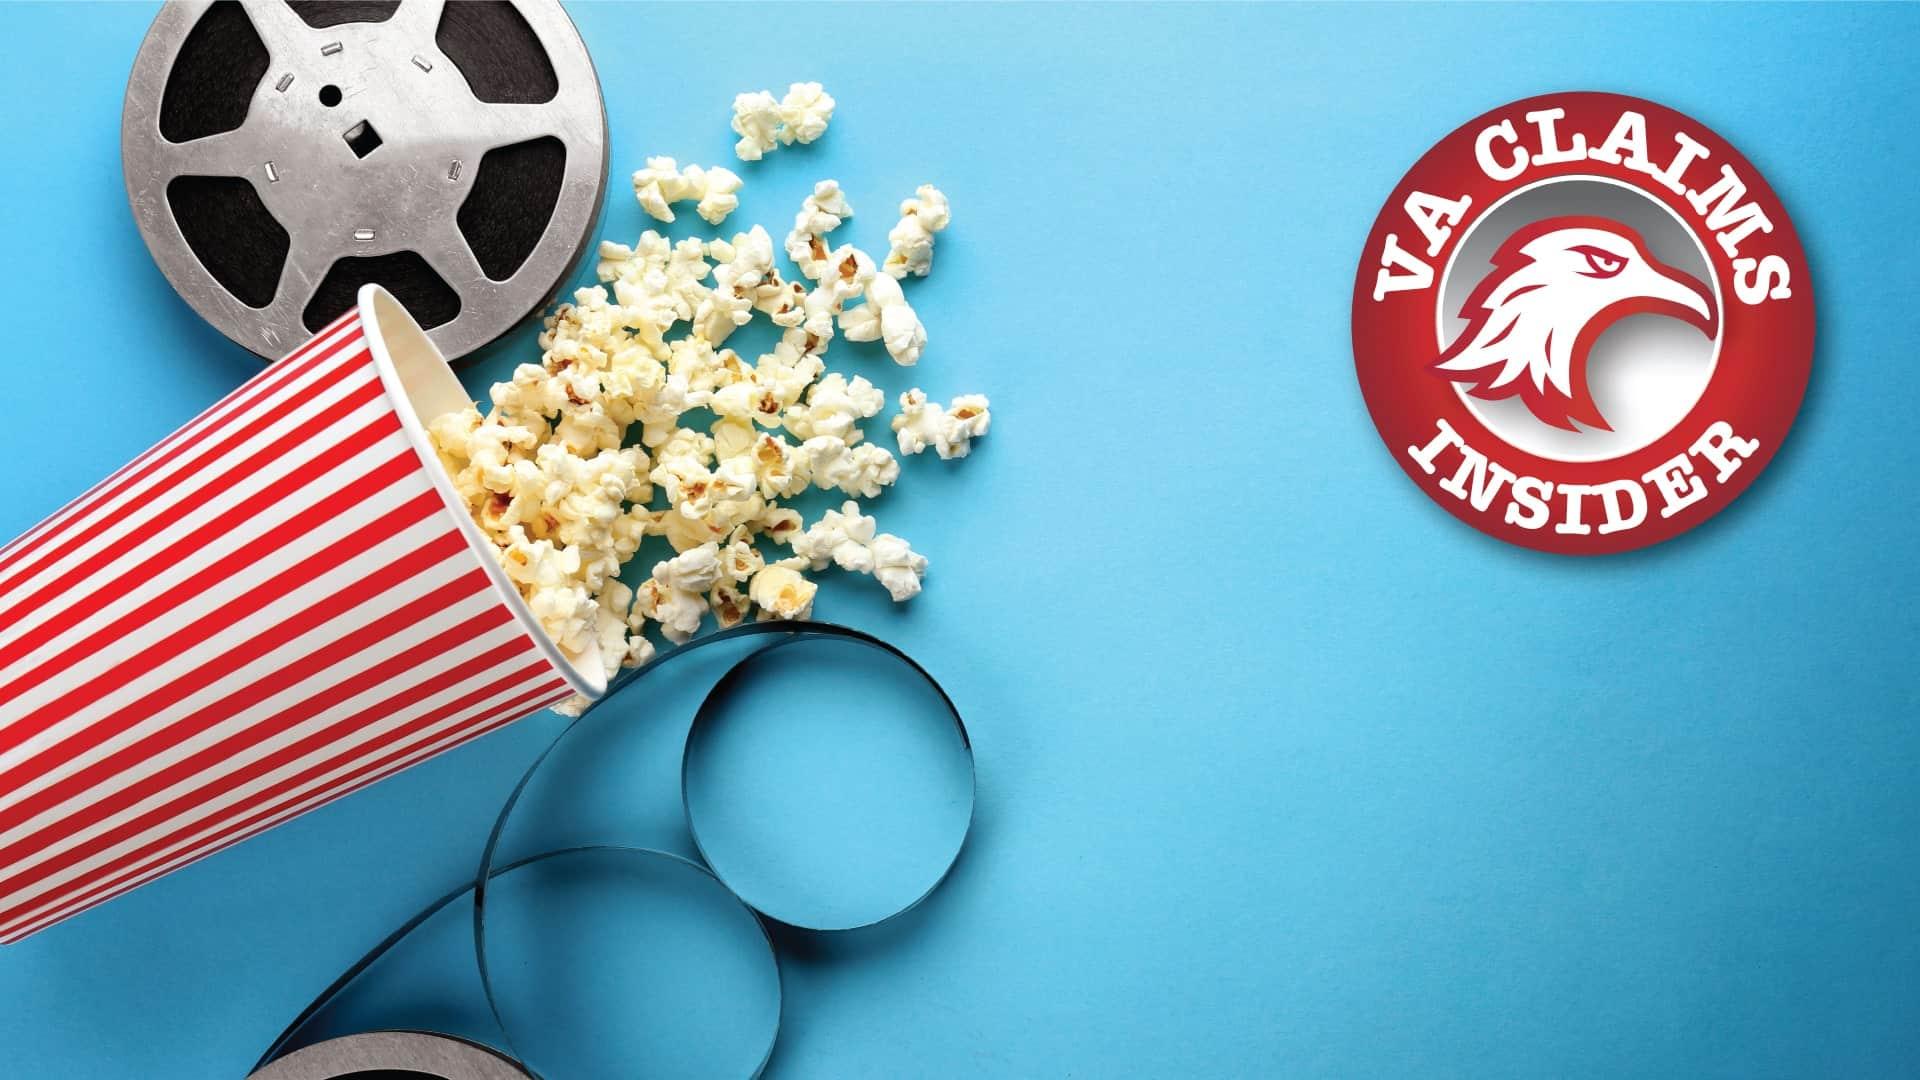 Entertainment Discounts for Veterans - VA Claims Insider